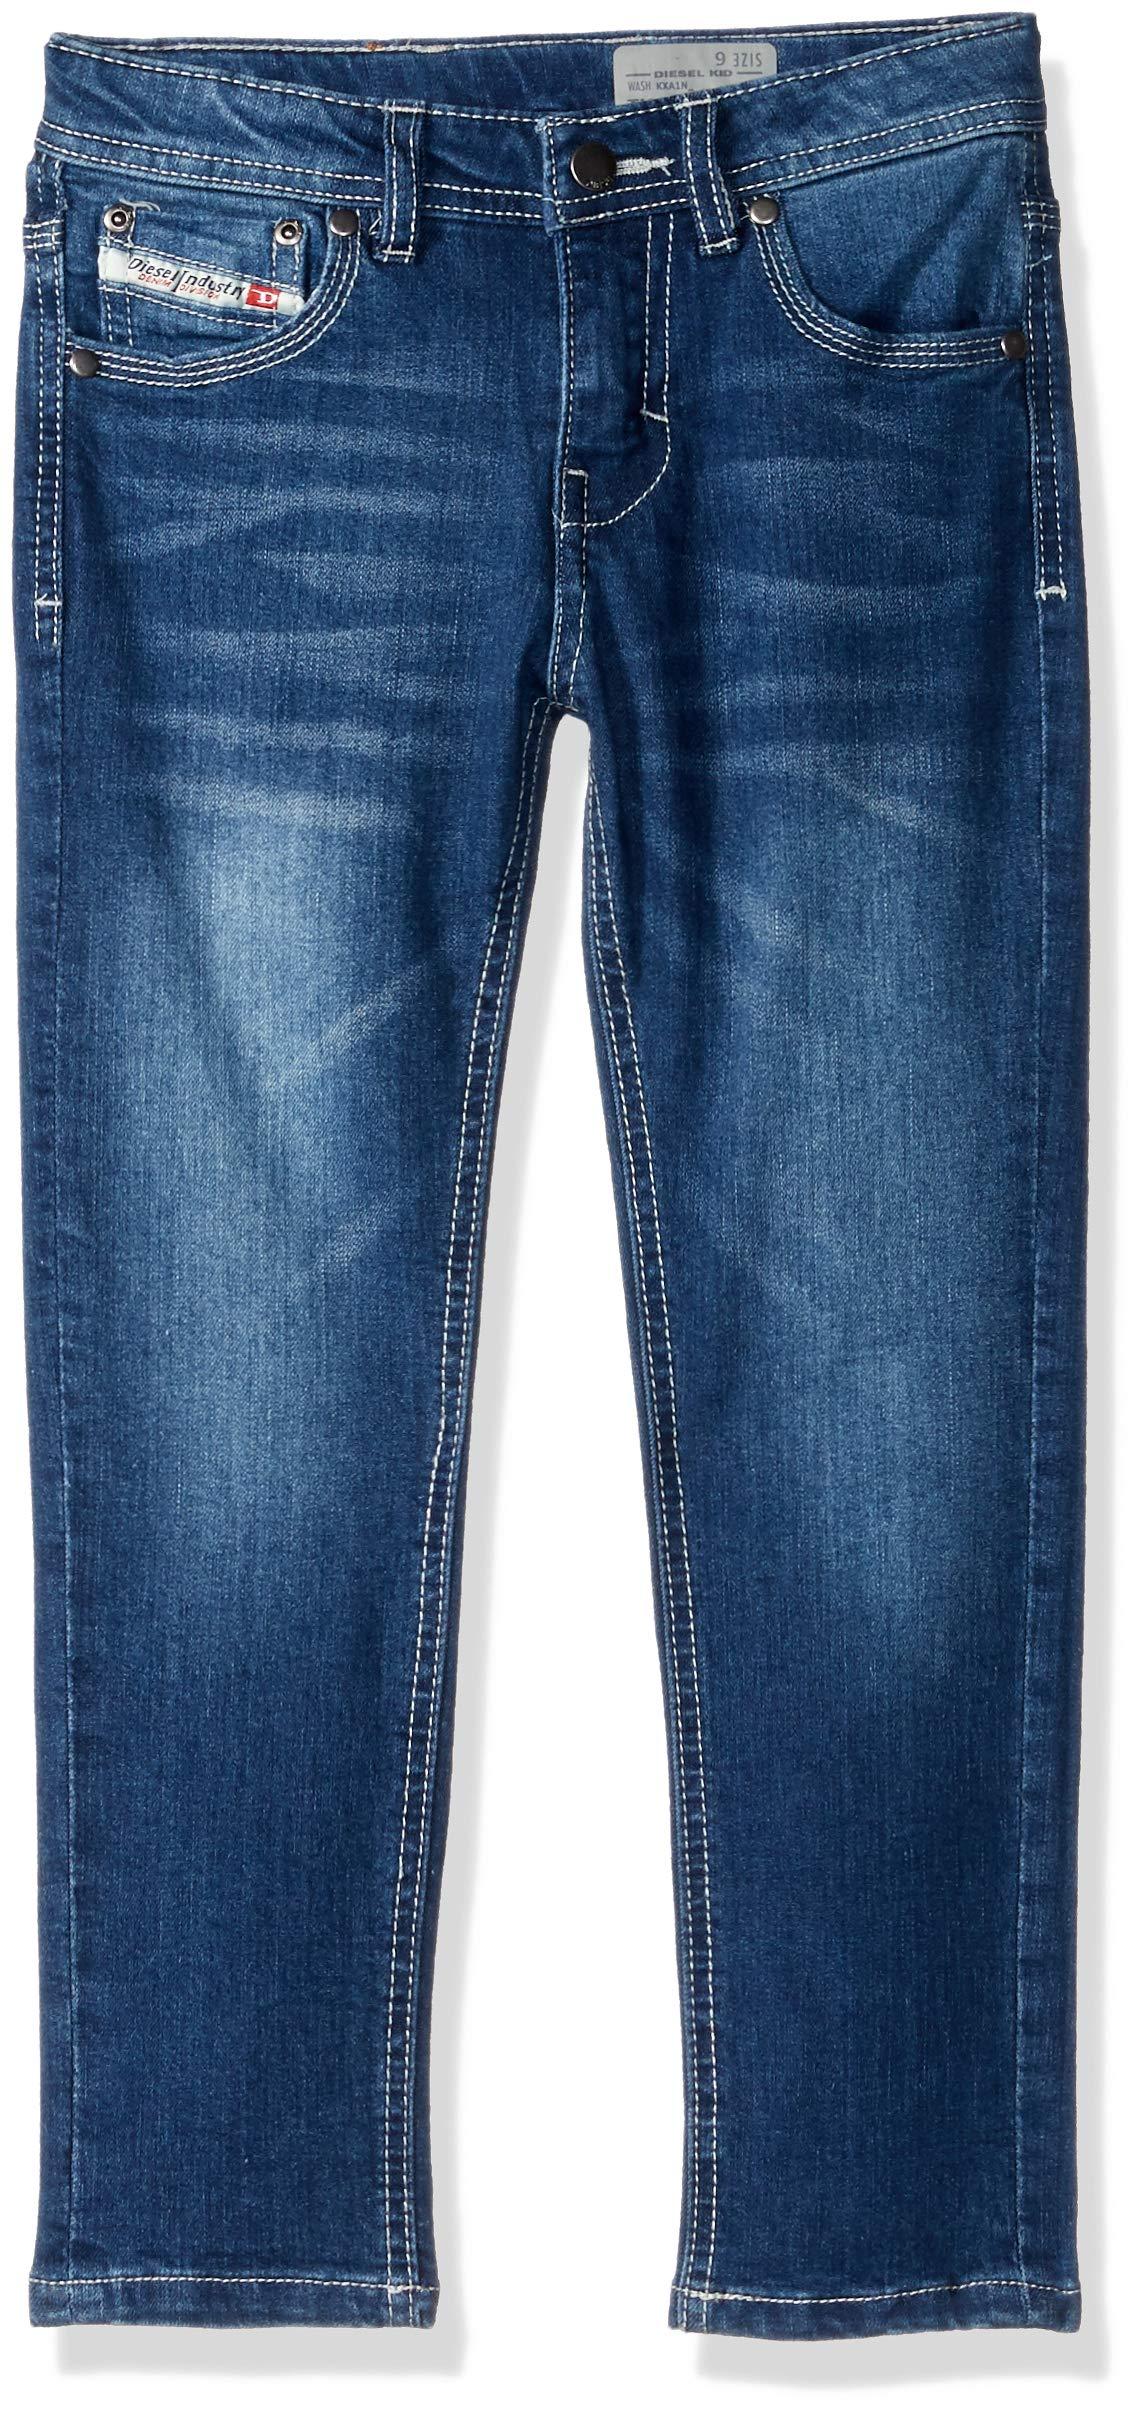 Diesel Boys' Big Essential Denim Jean, Medium Indigo, 14